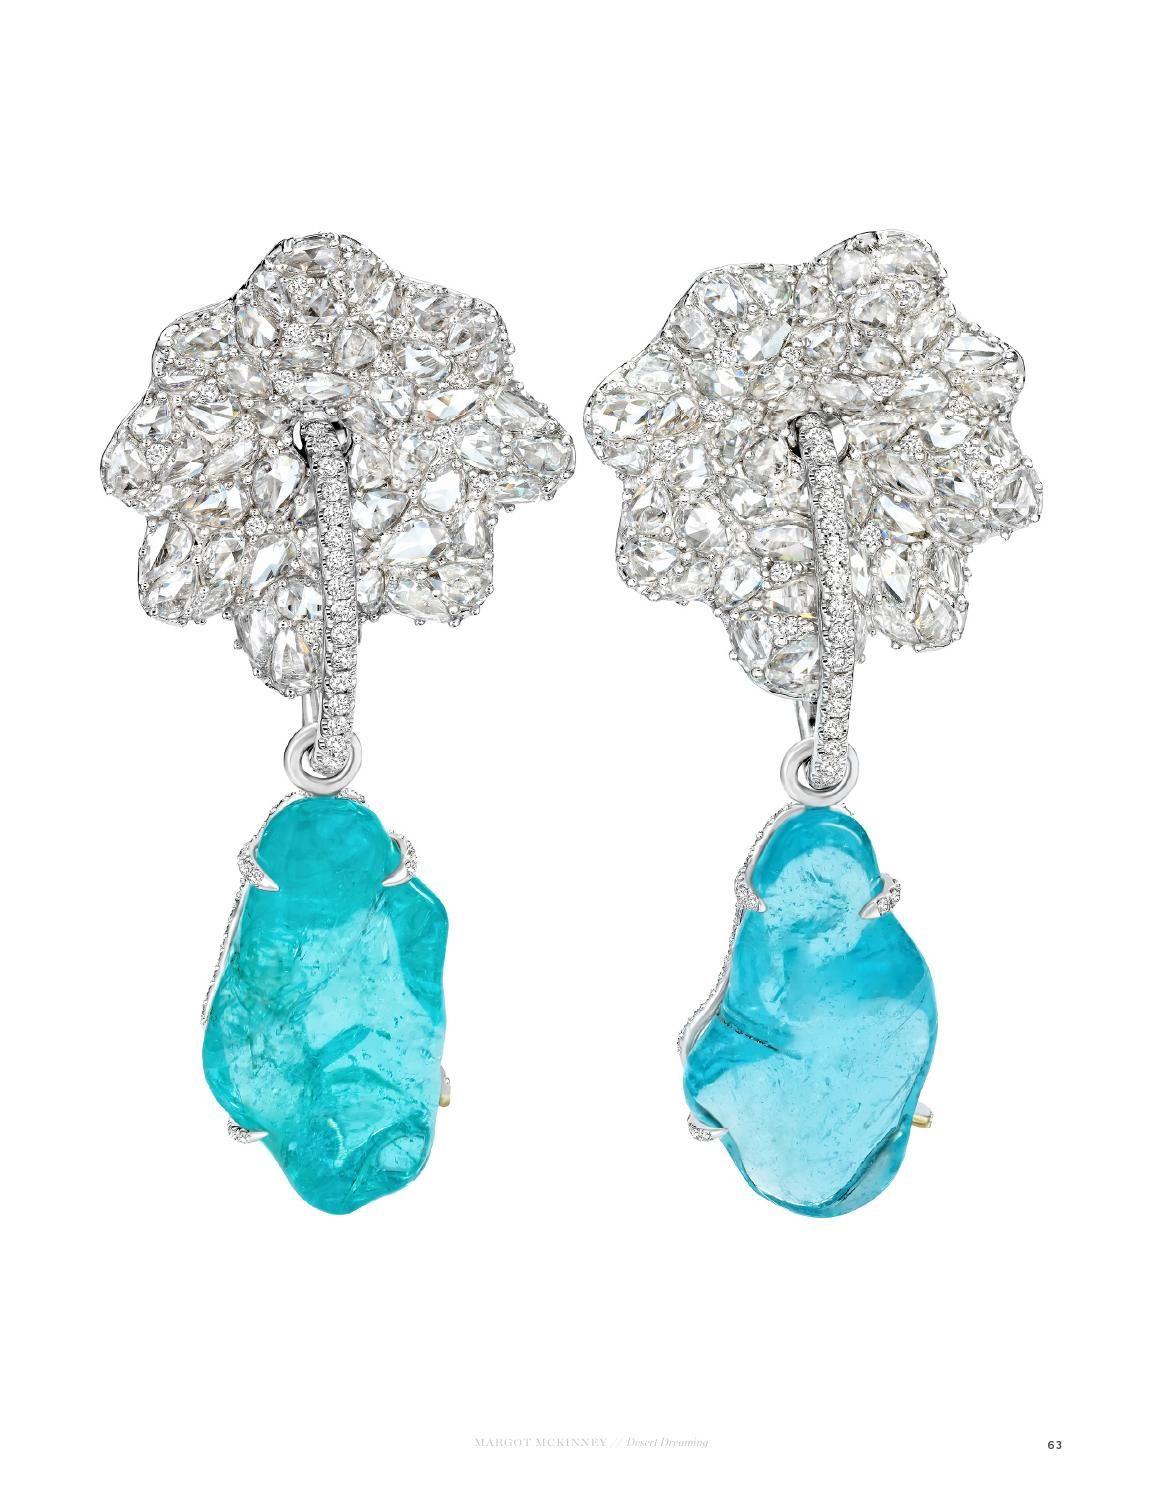 Margot McKinney Jewelry Weekend White Agate Earrings with Turquoise Studs 1zM1Adjs